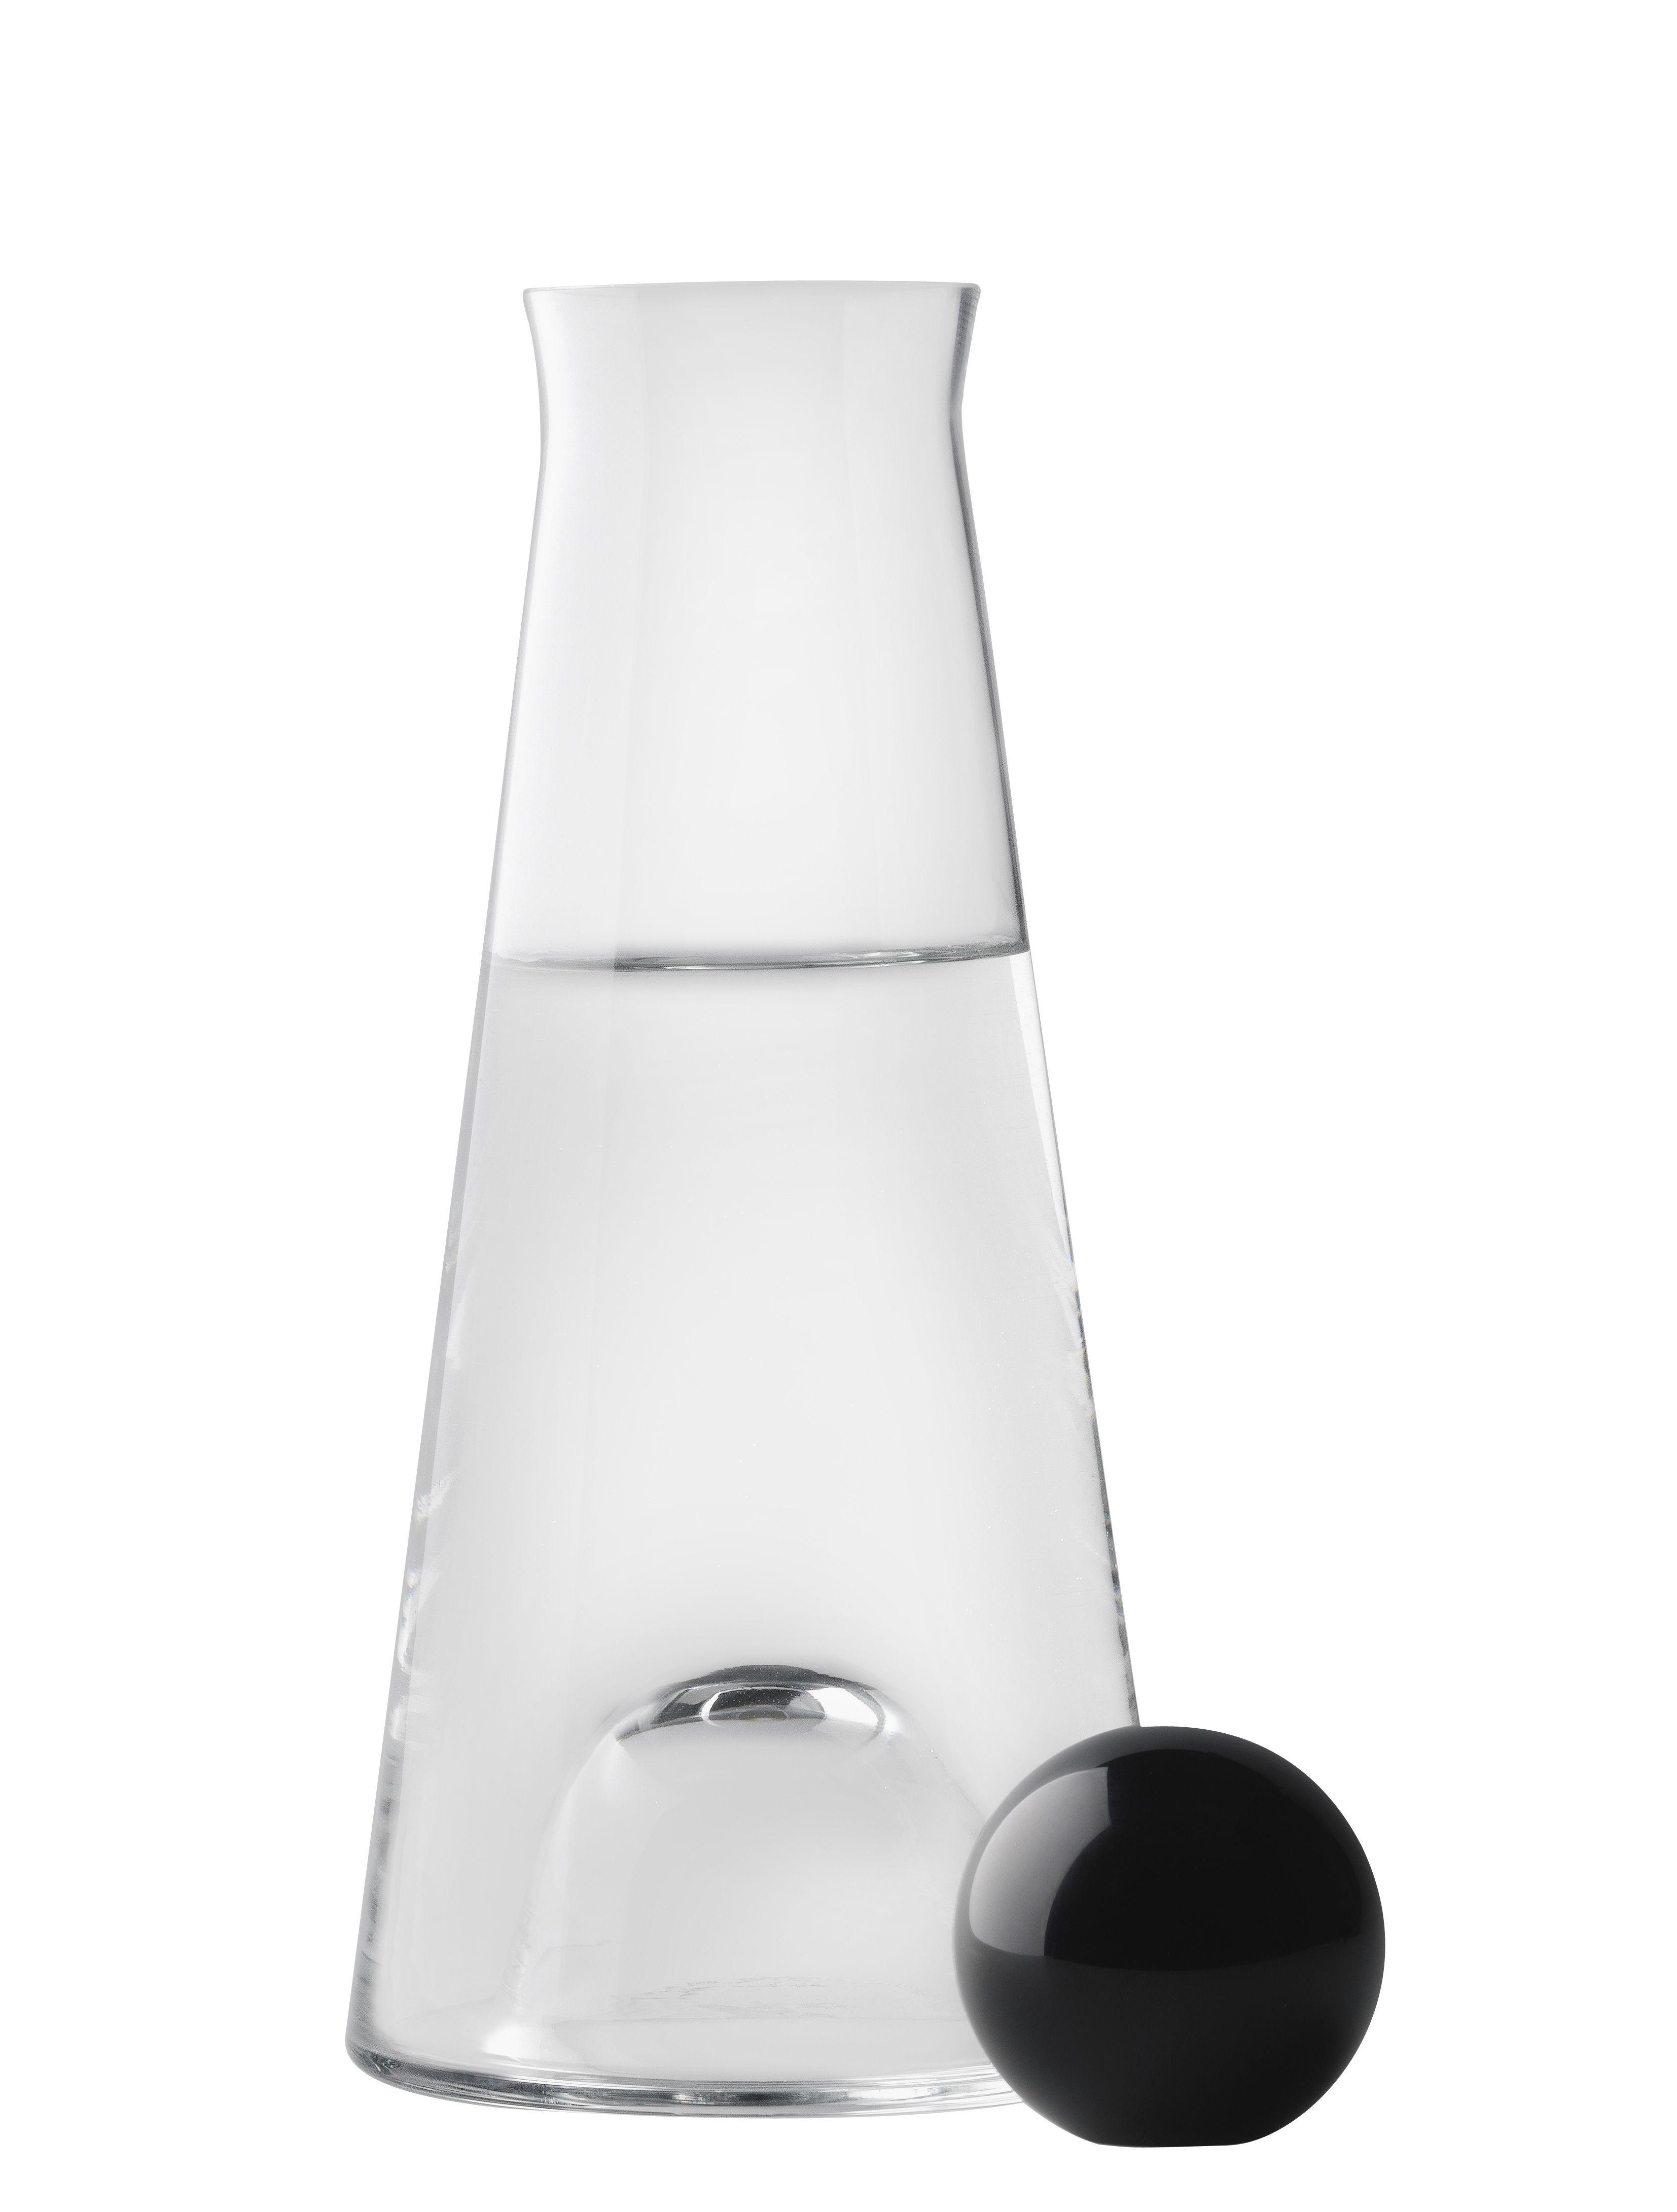 Tischkultur - Karaffen - Fia Karaffe 1 L - Design House Stockholm - Transparent / schwarz - Glas, Kristall